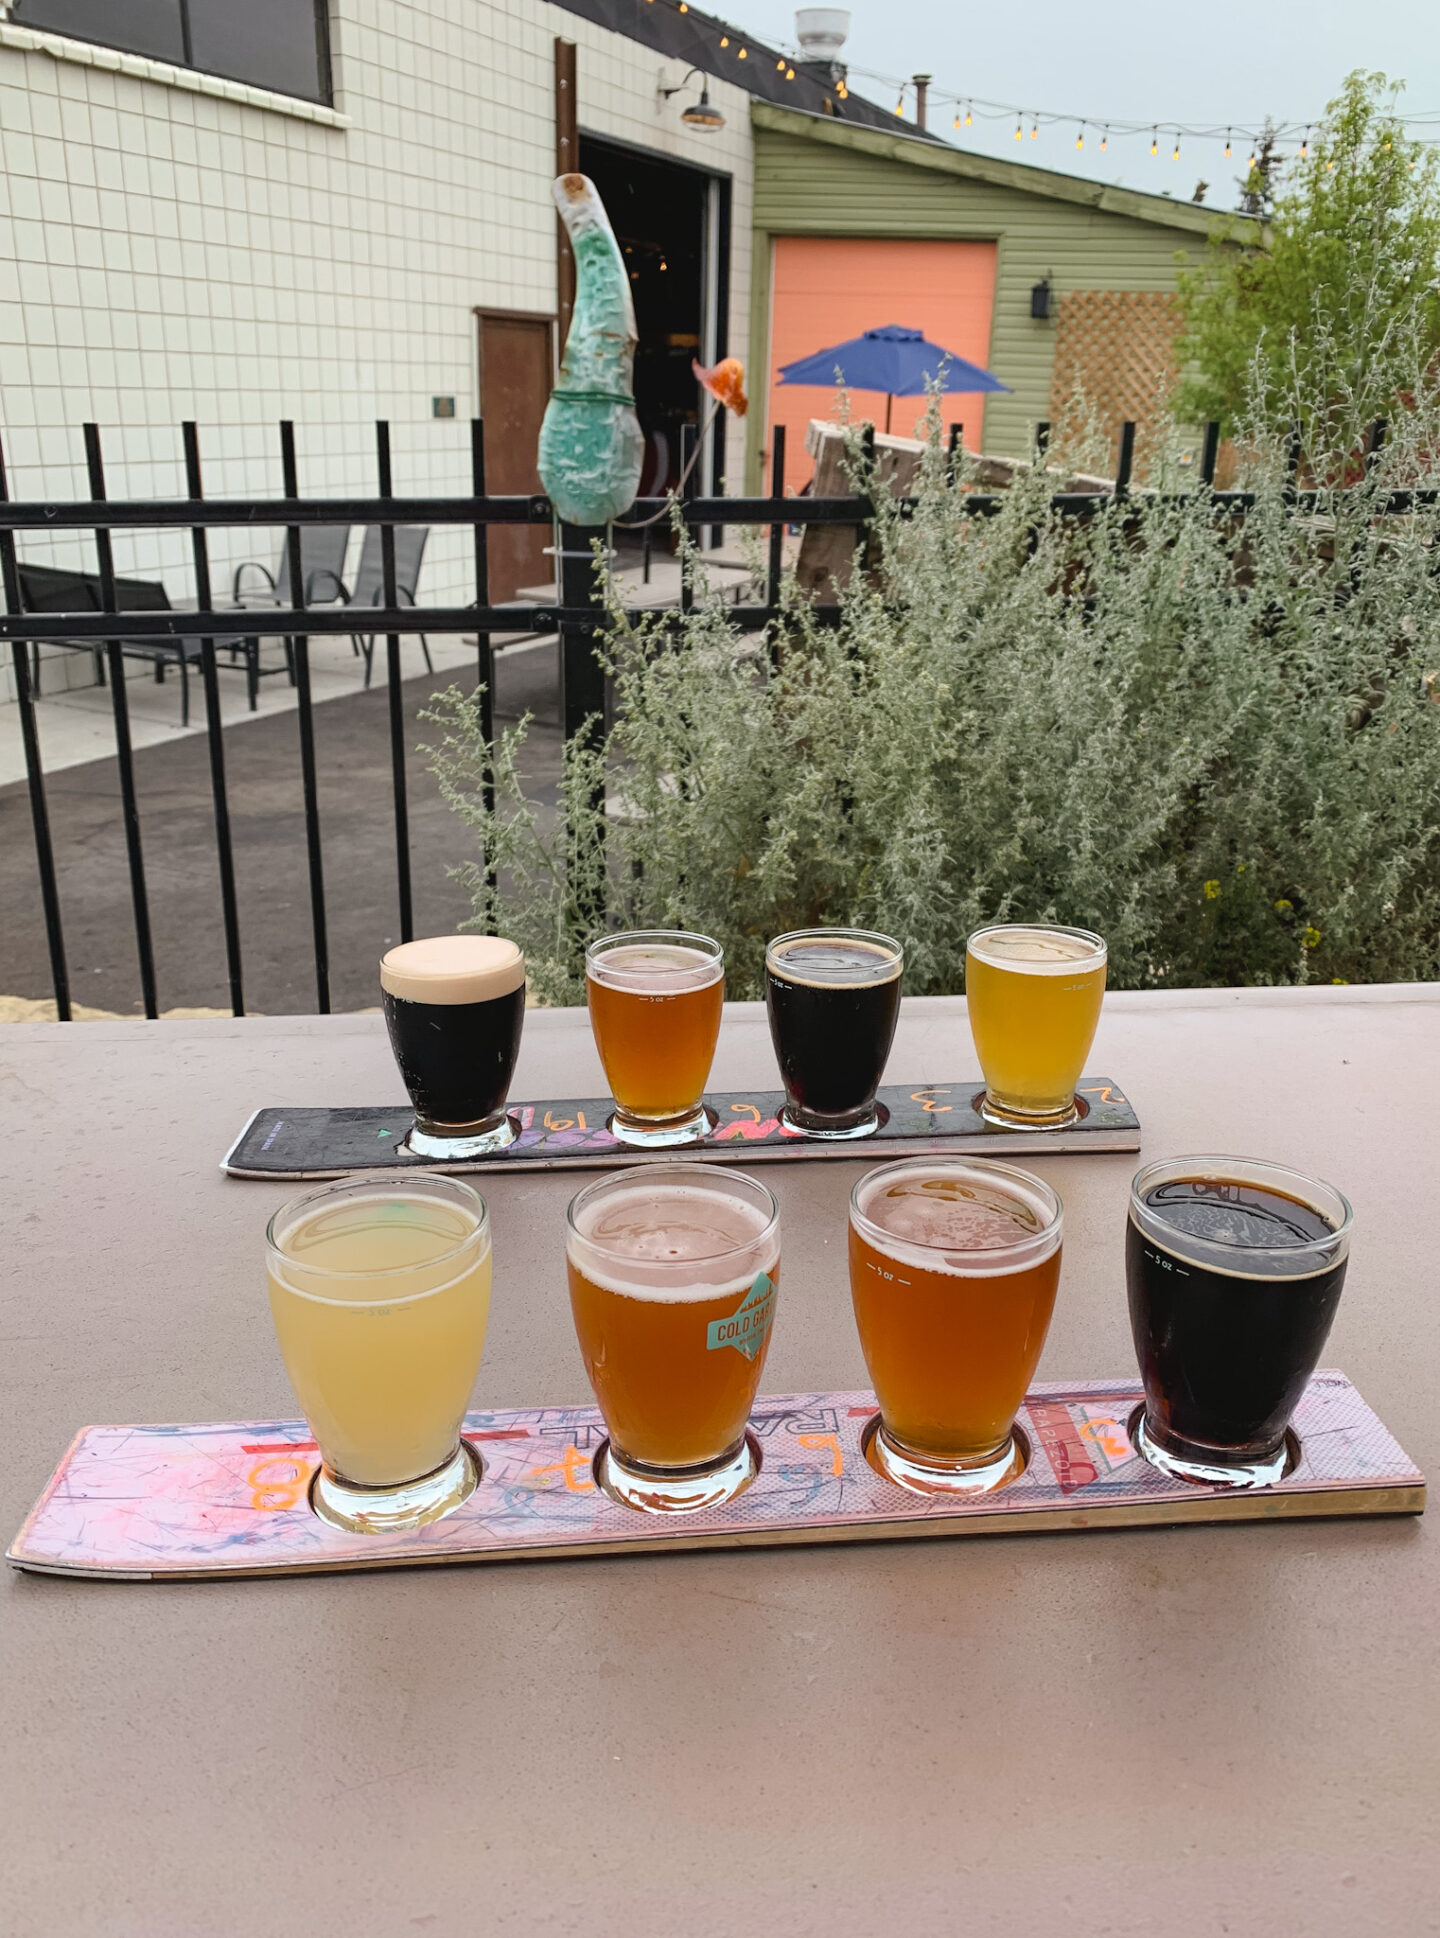 Craft beer flights from Cold Garden Beverage Company in Calgary, Alberta